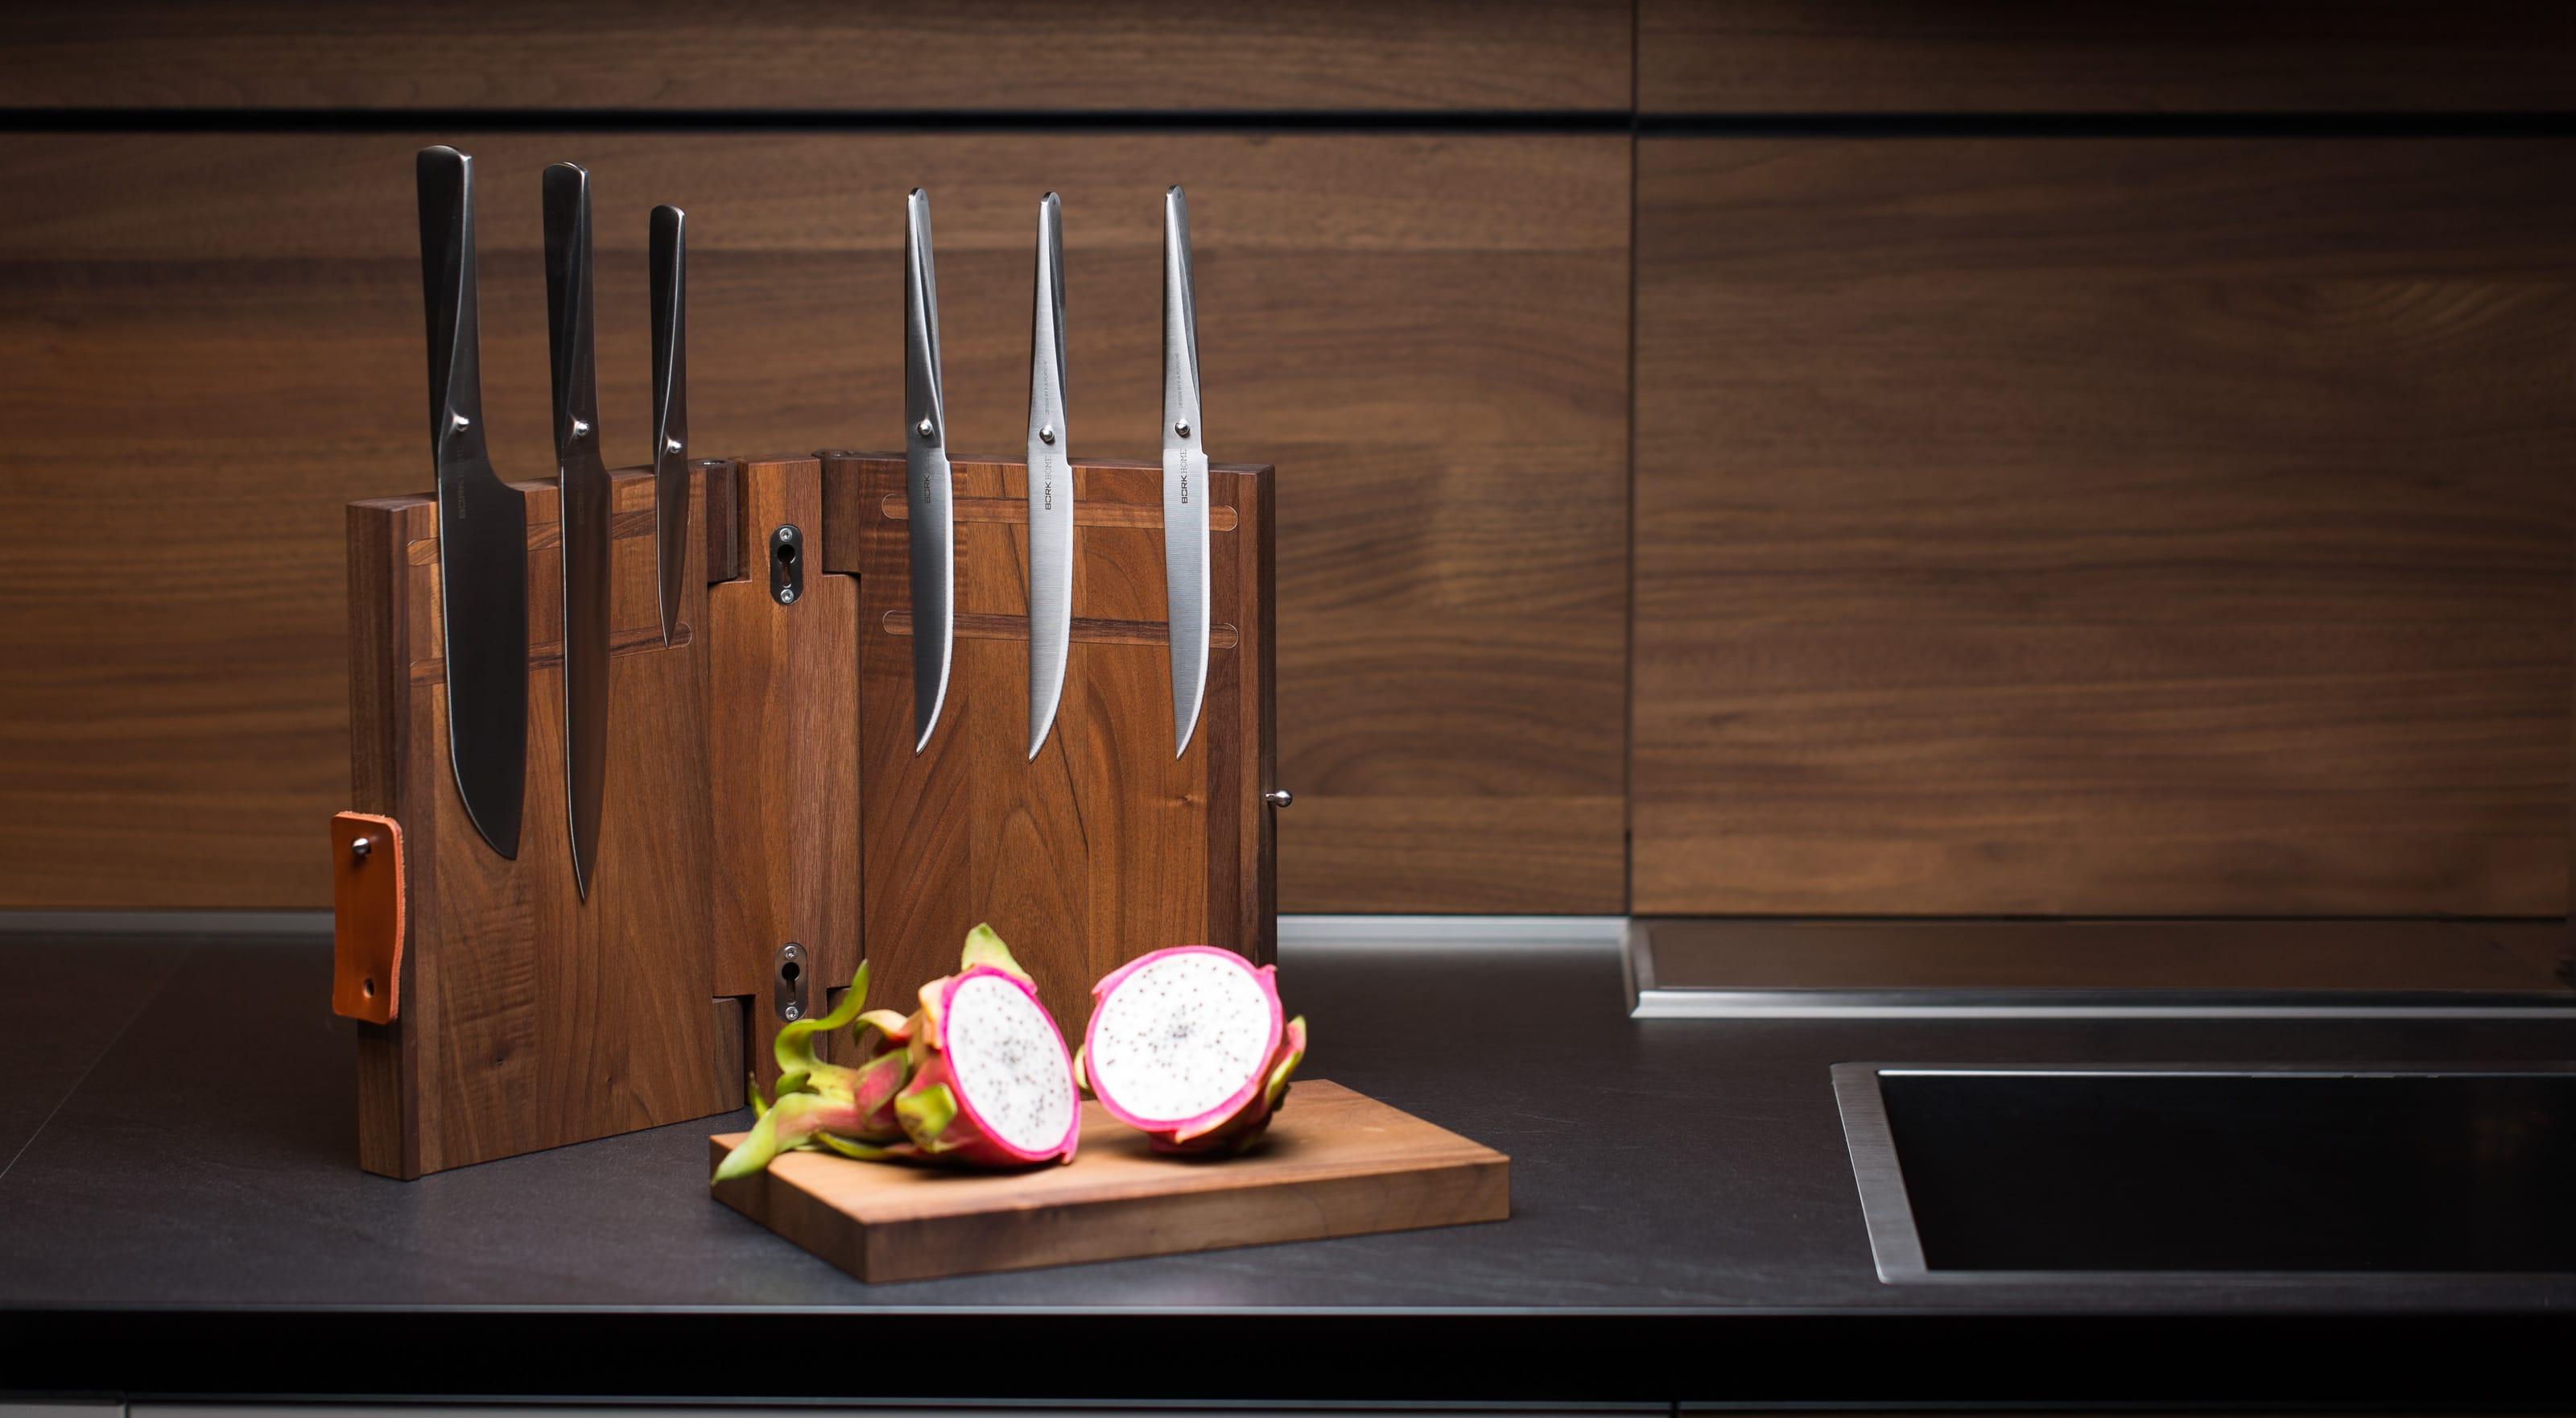 Подставка для ножей на кухне